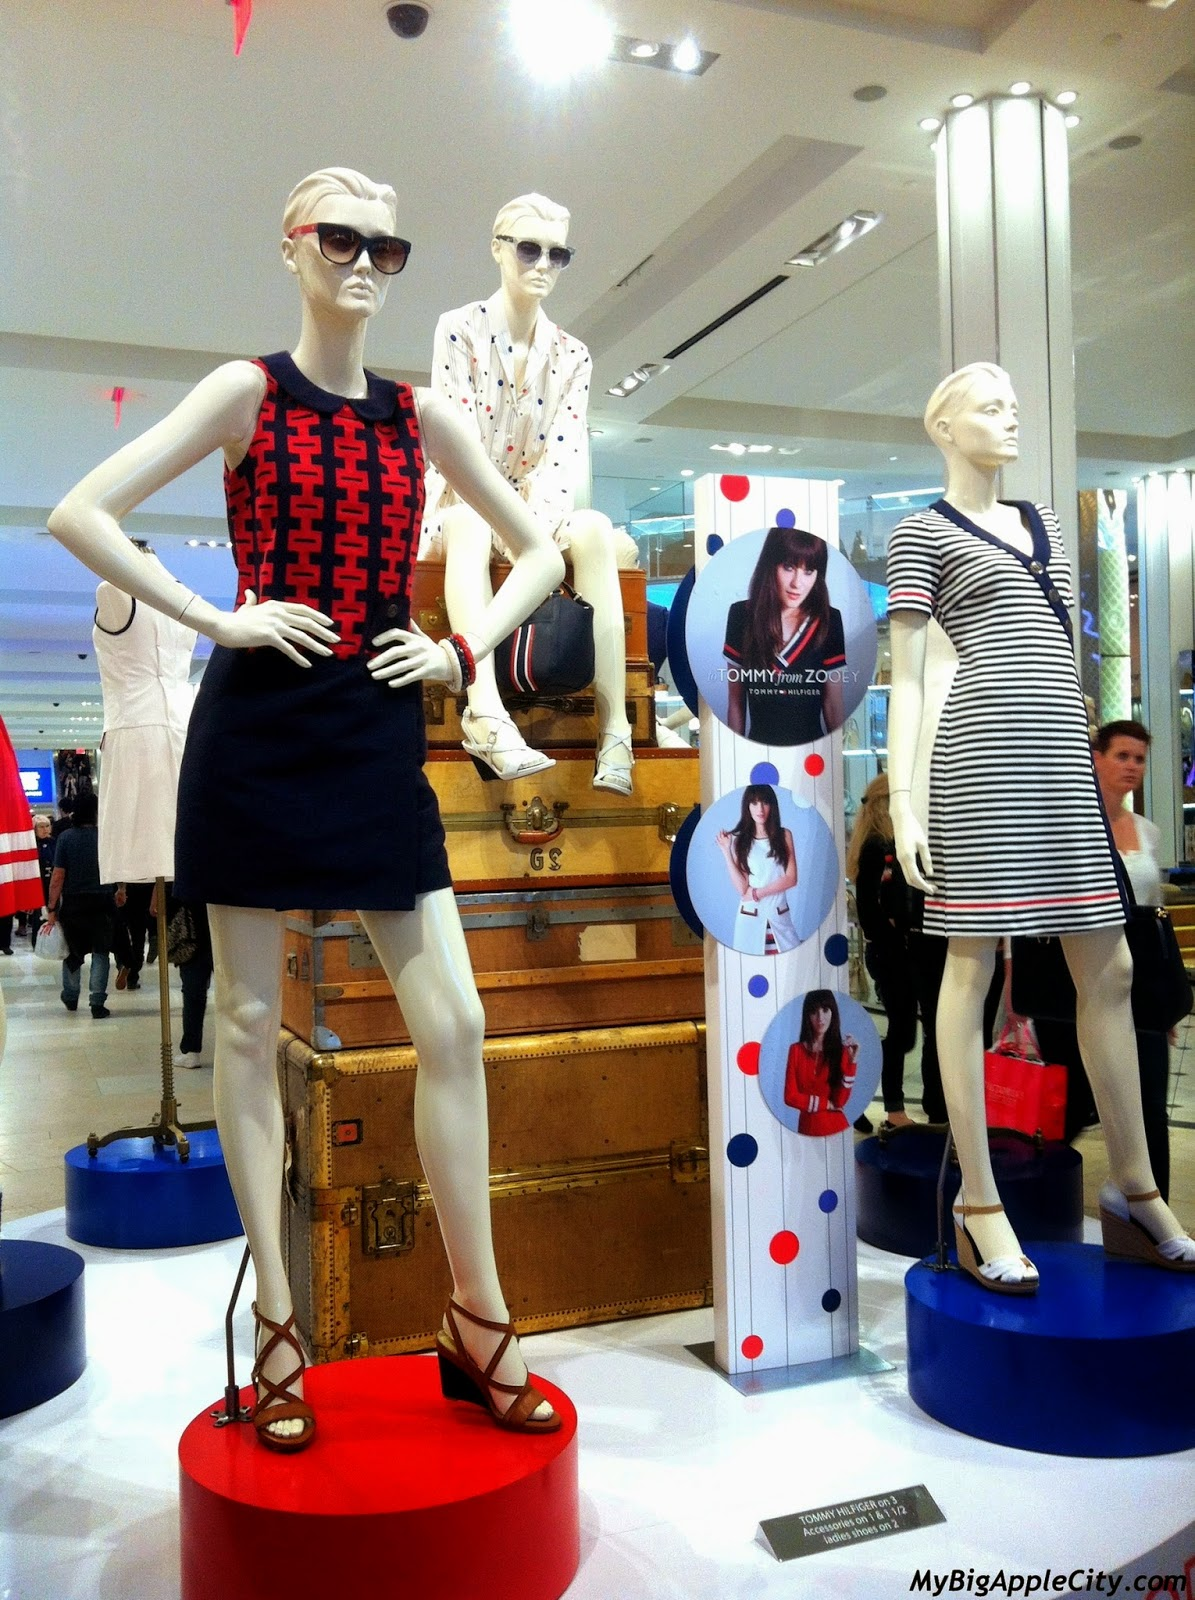 hilfiger-spring2014-nyc-fashion-mybigapplecity